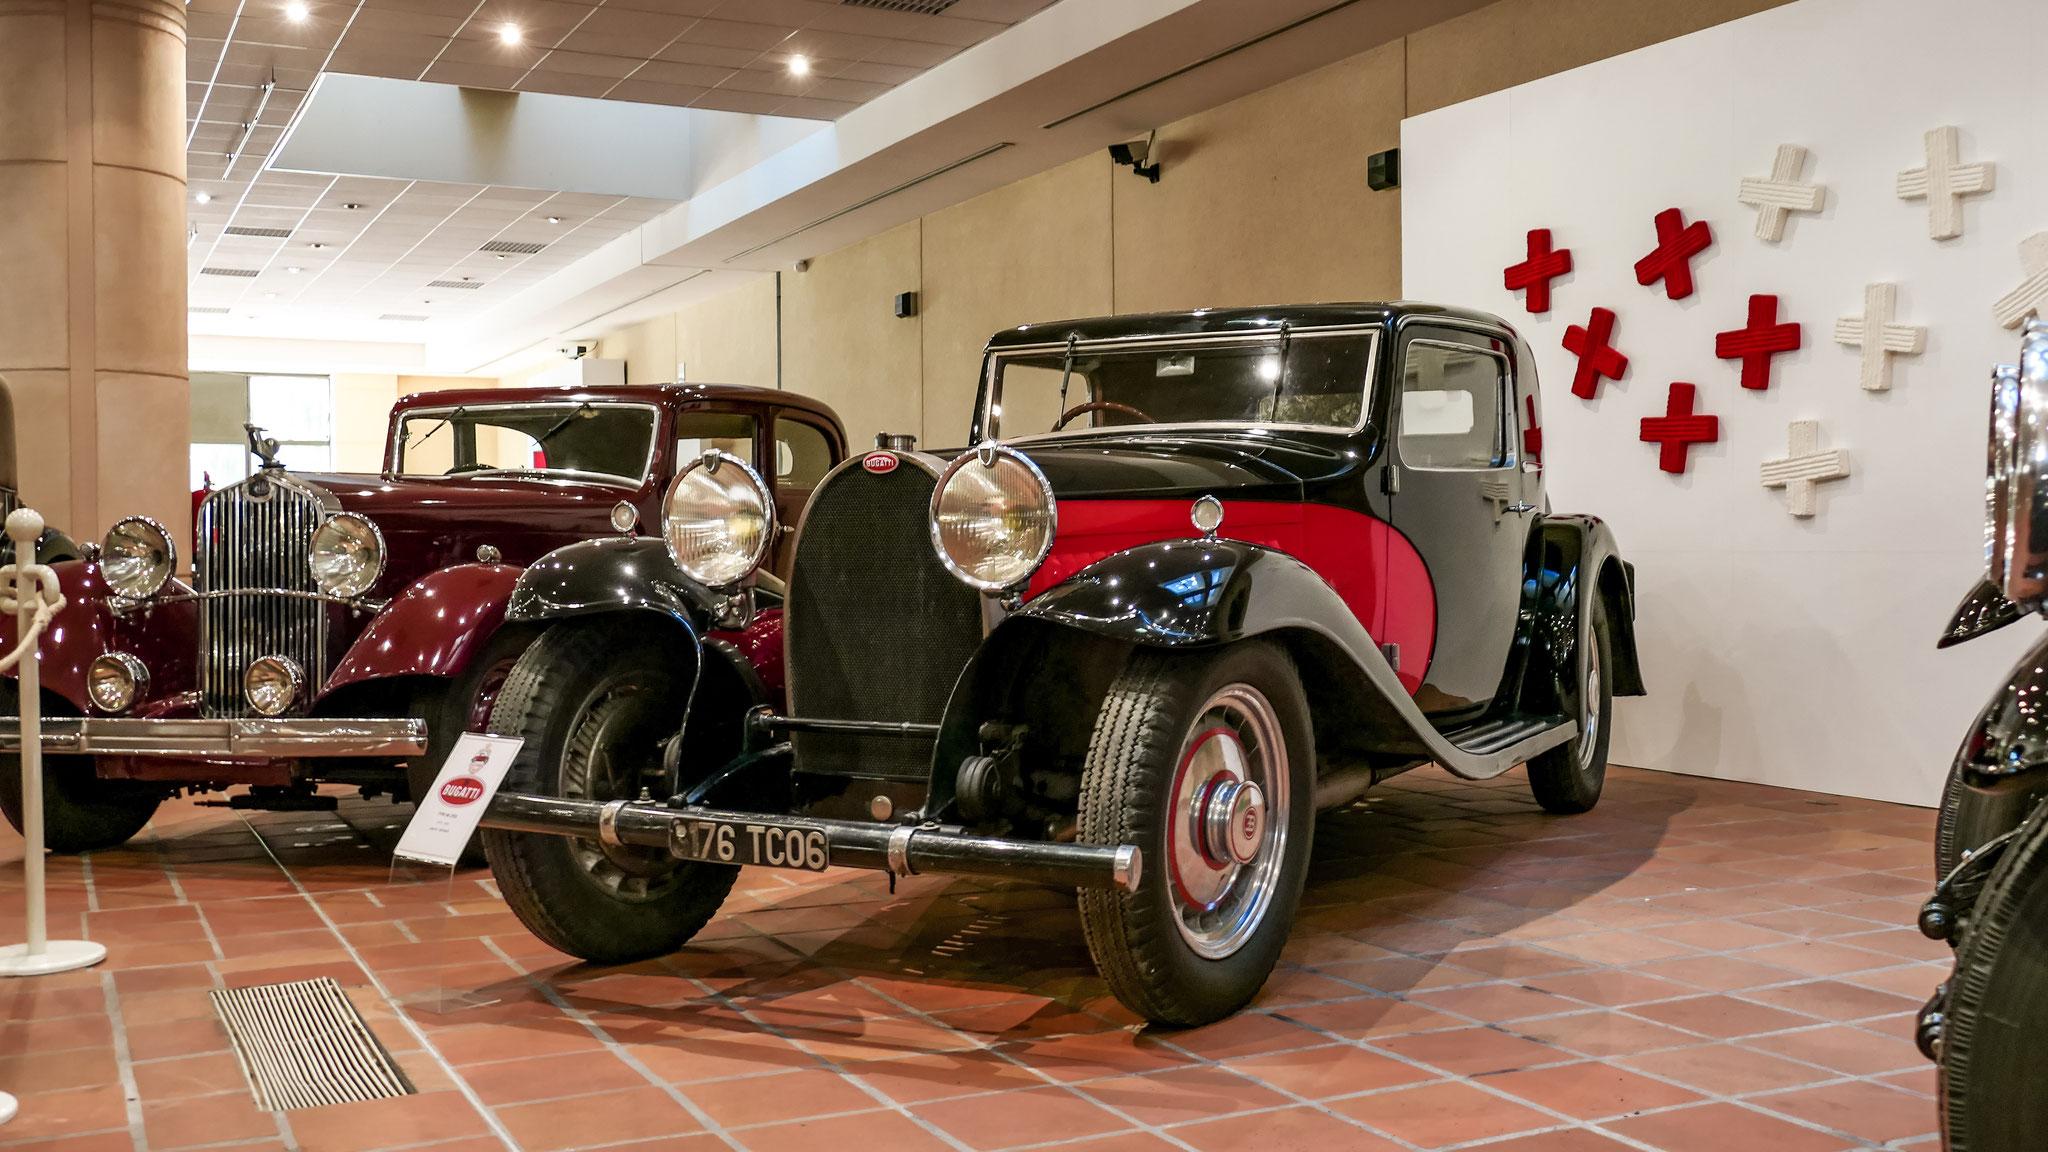 Bugatti Type 46 - 176-TC06 (GB)